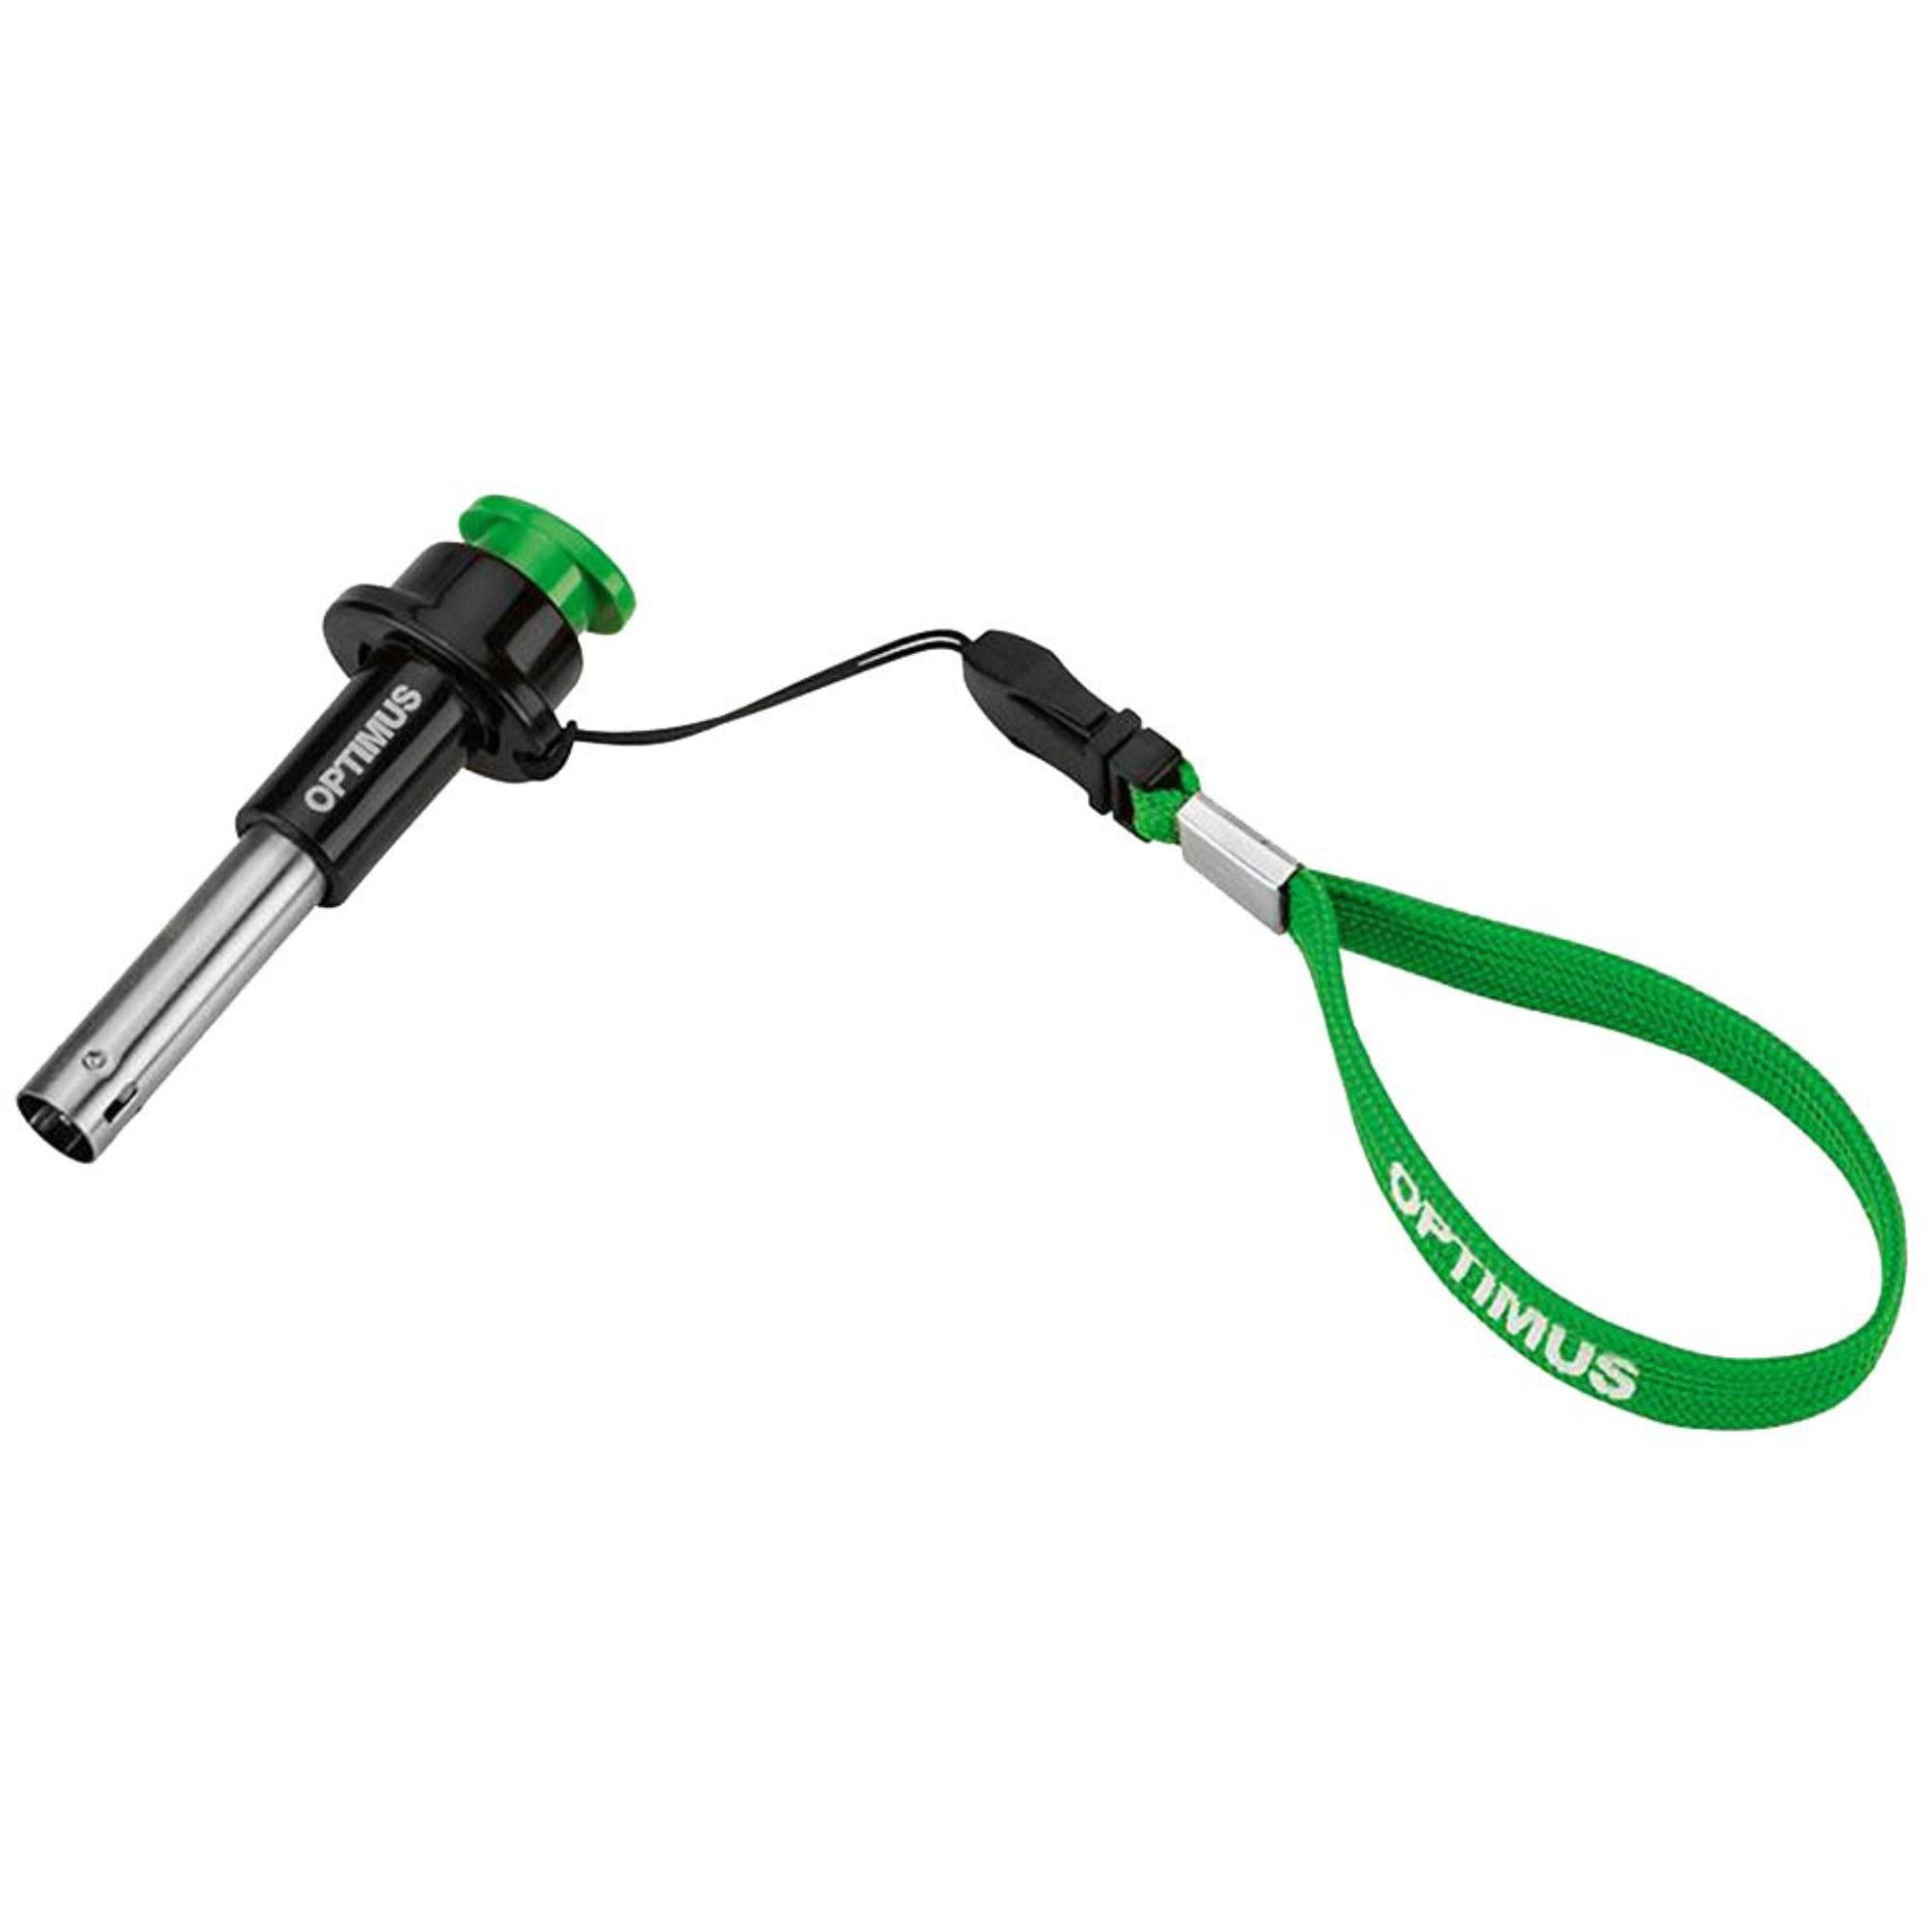 Optimus Sparky Green